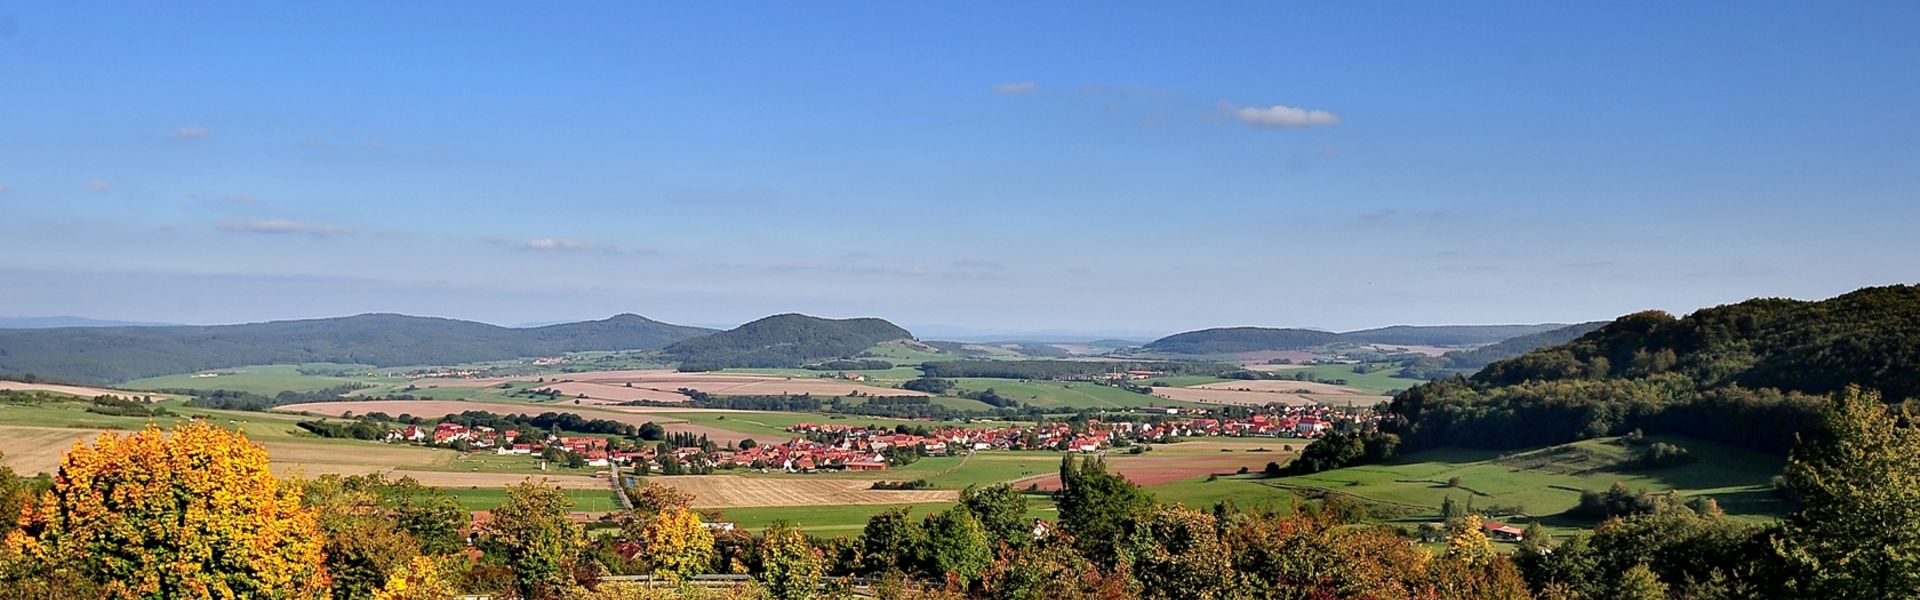 RAG LEADER Wartburgregion